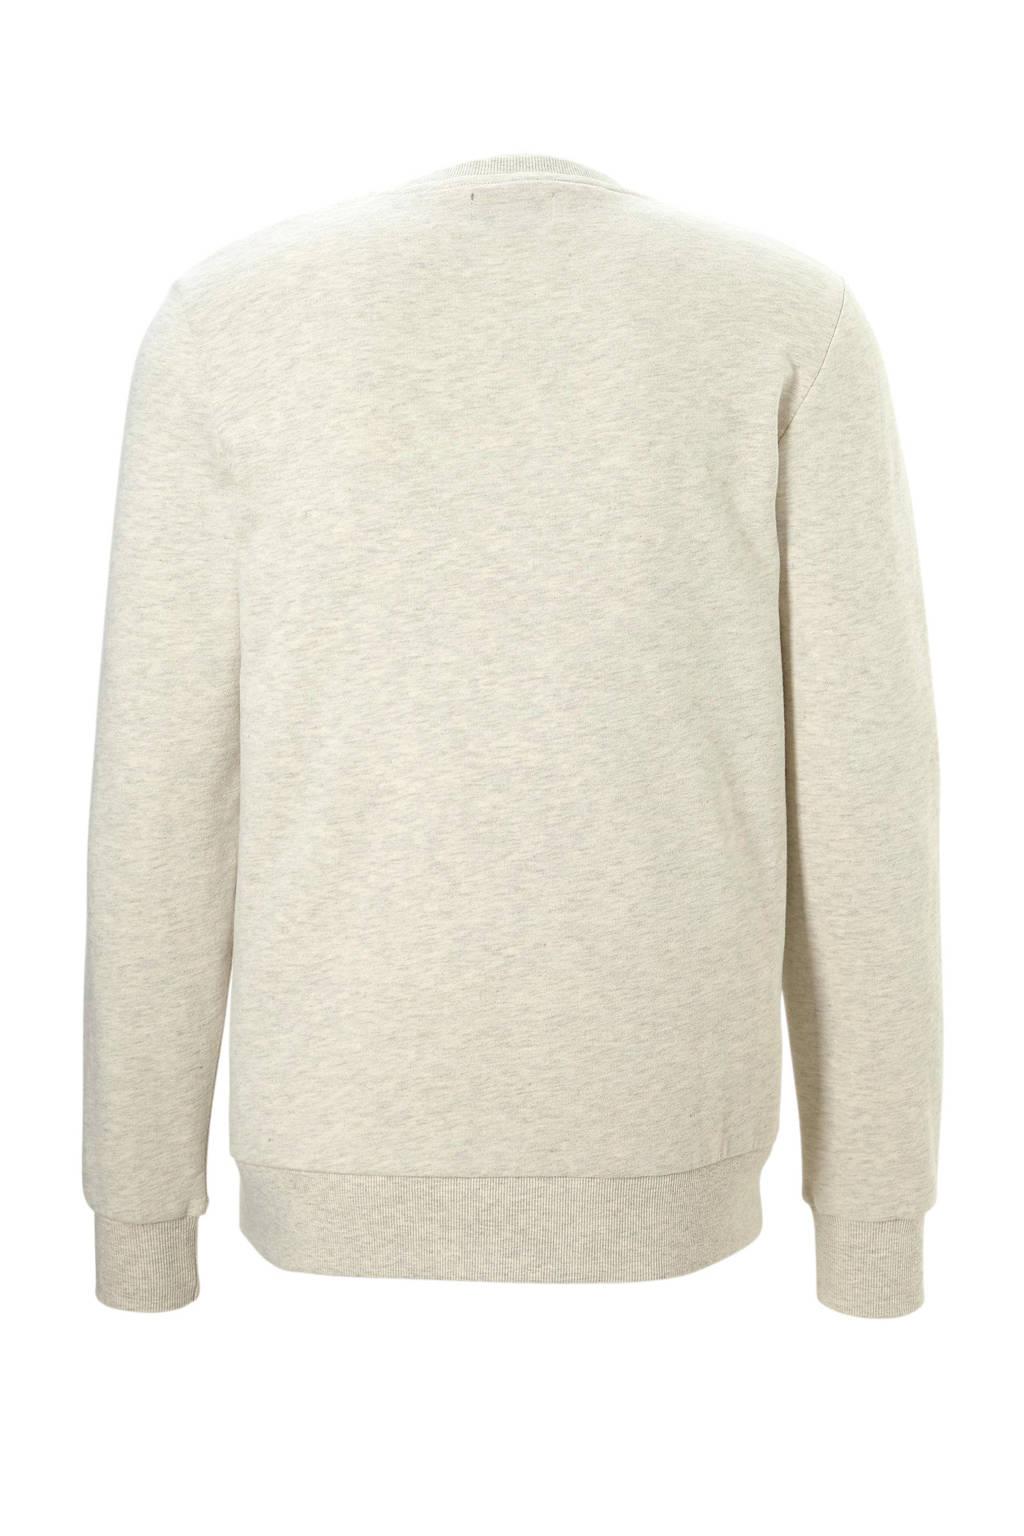 JACK & JONES PREMIUM sweater, Wit